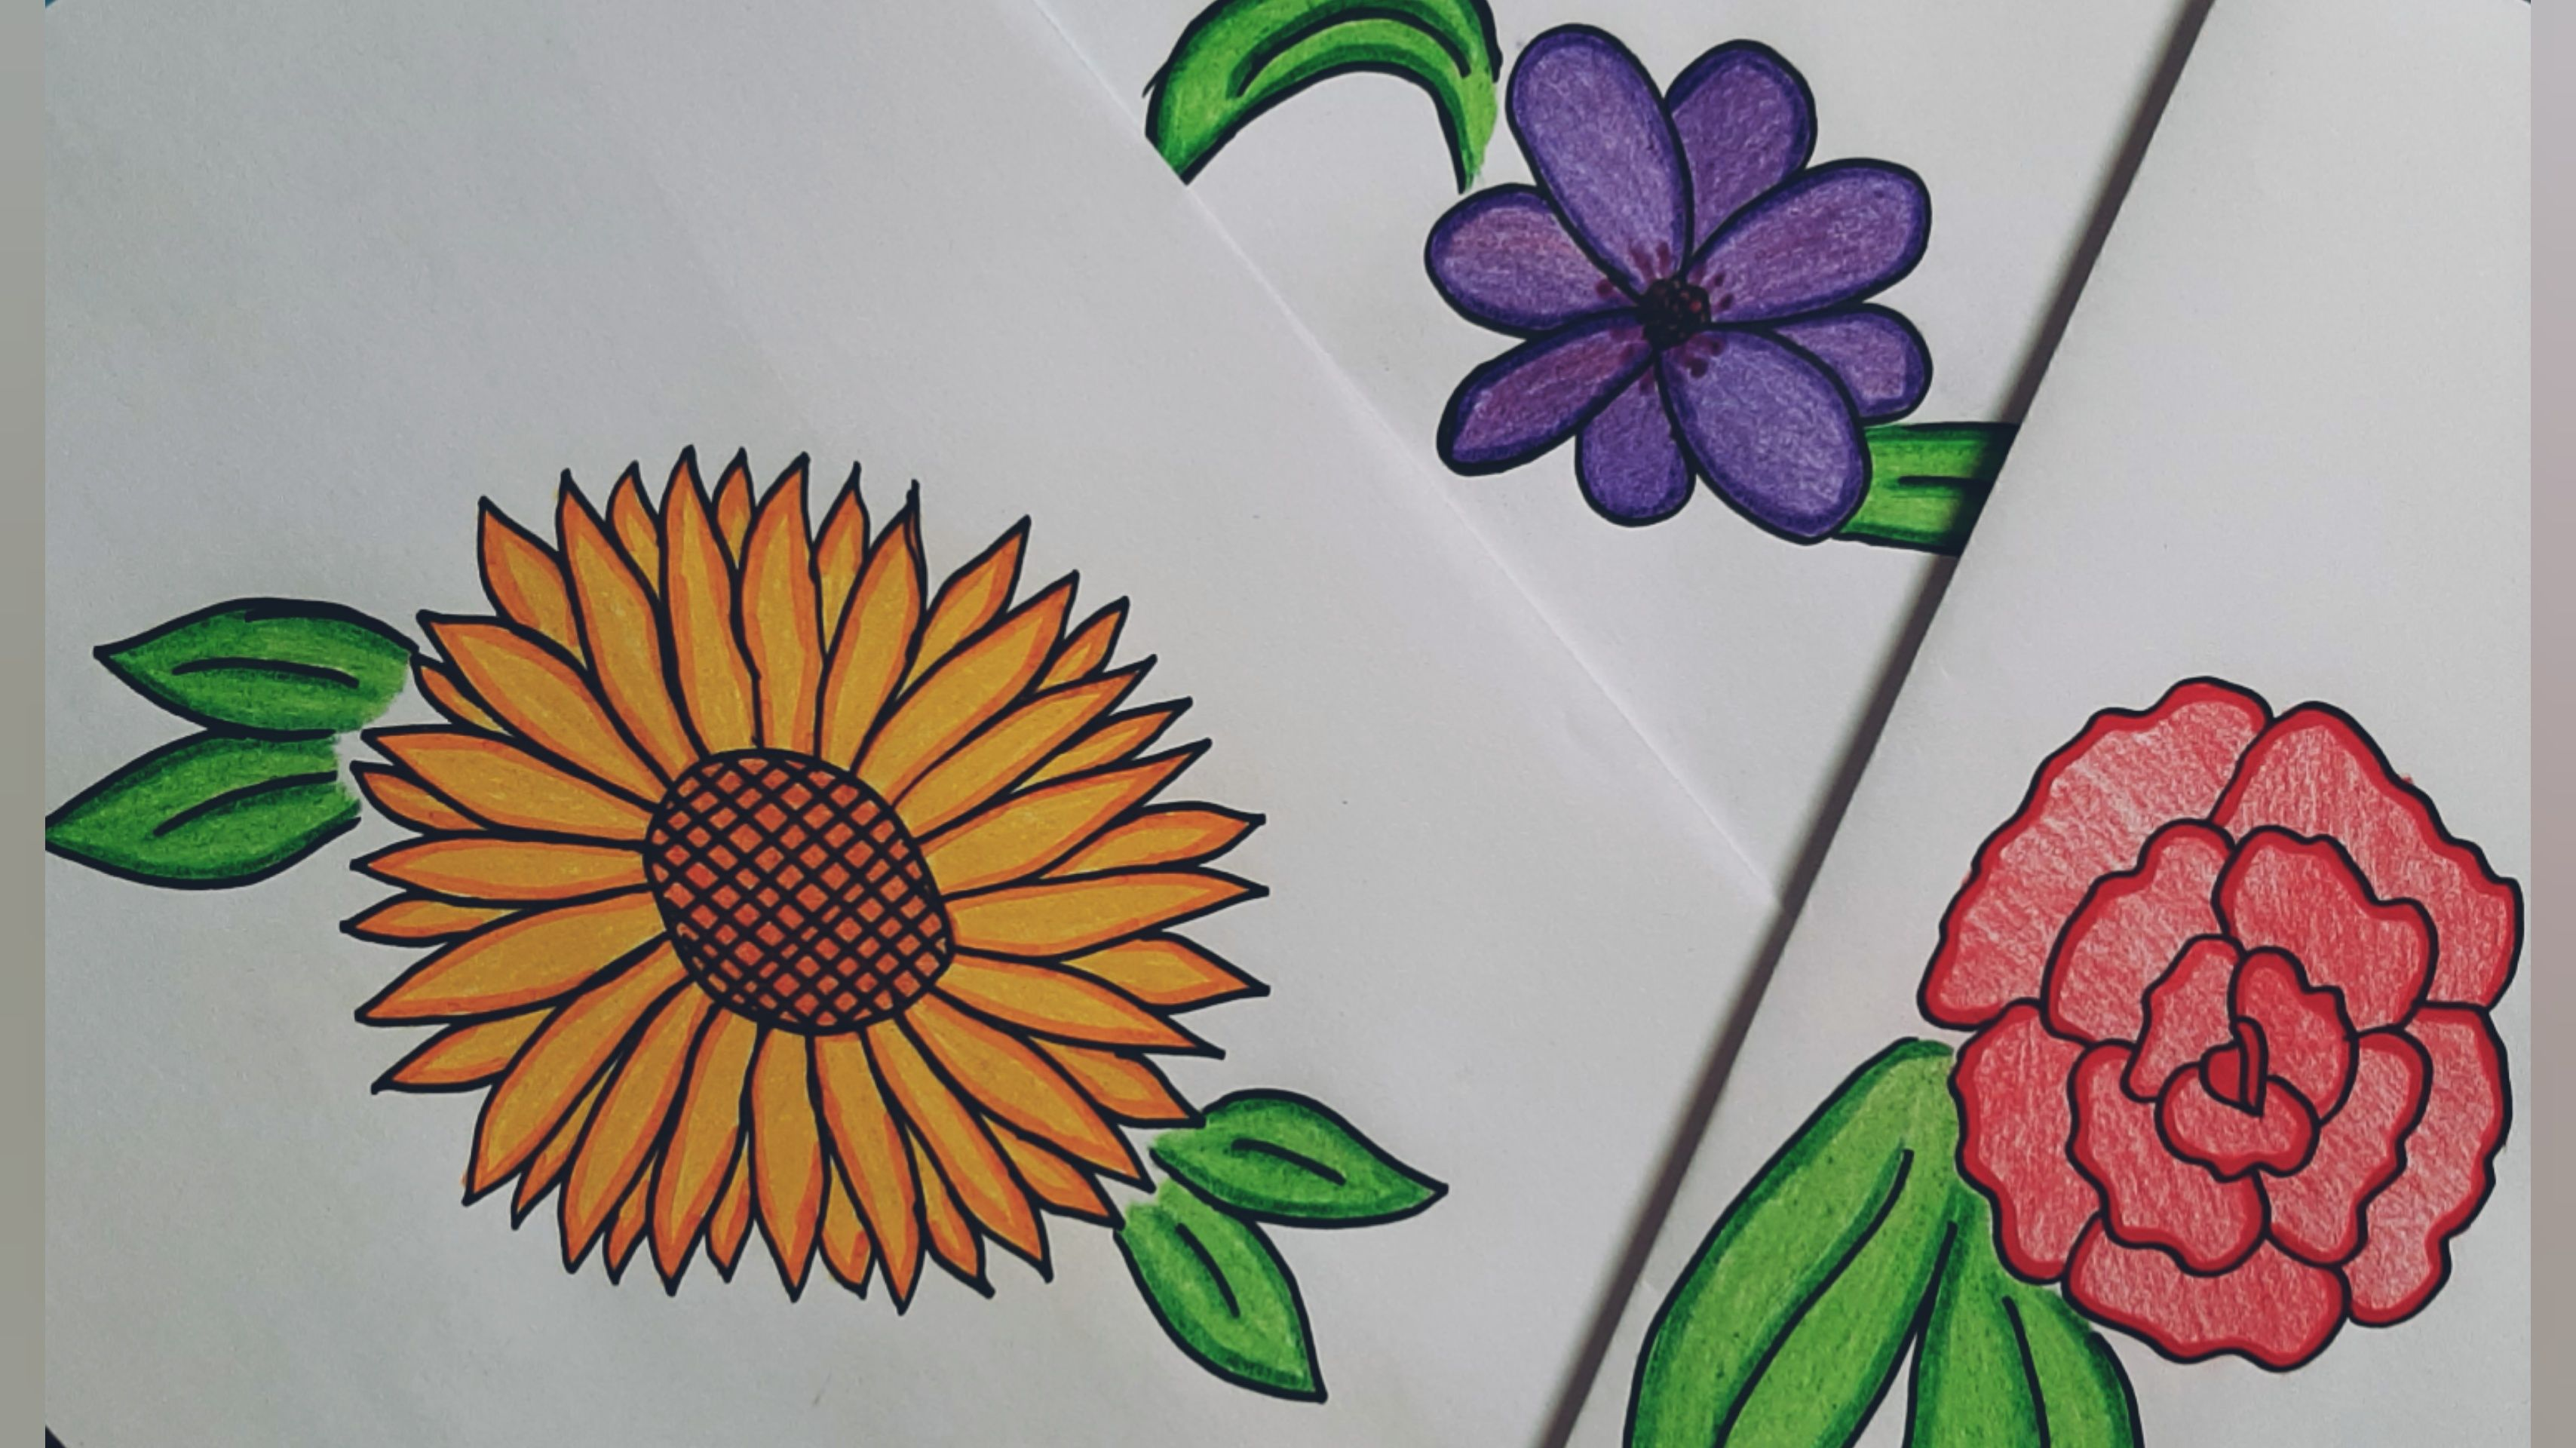 How To Draw Flower In Three Different Ways رسم وردة بثلاث طرق مختلفة Drawing For Kids Cartoon Drawings Drawings